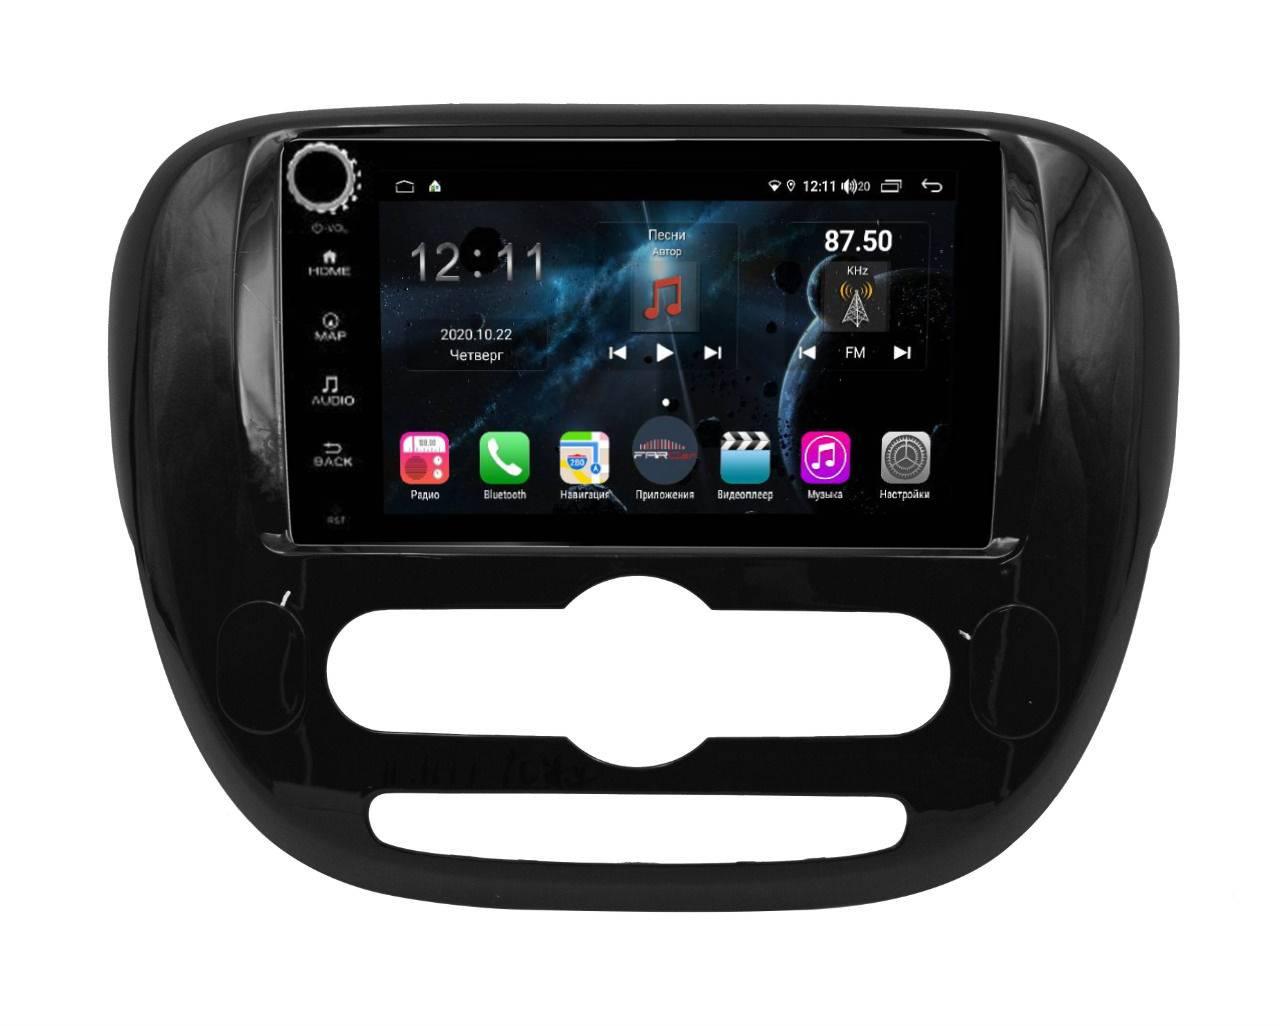 Штатная магнитола FarCar s400 для KIA Soul на Android (H526RB) (+ Камера заднего вида в подарок!)